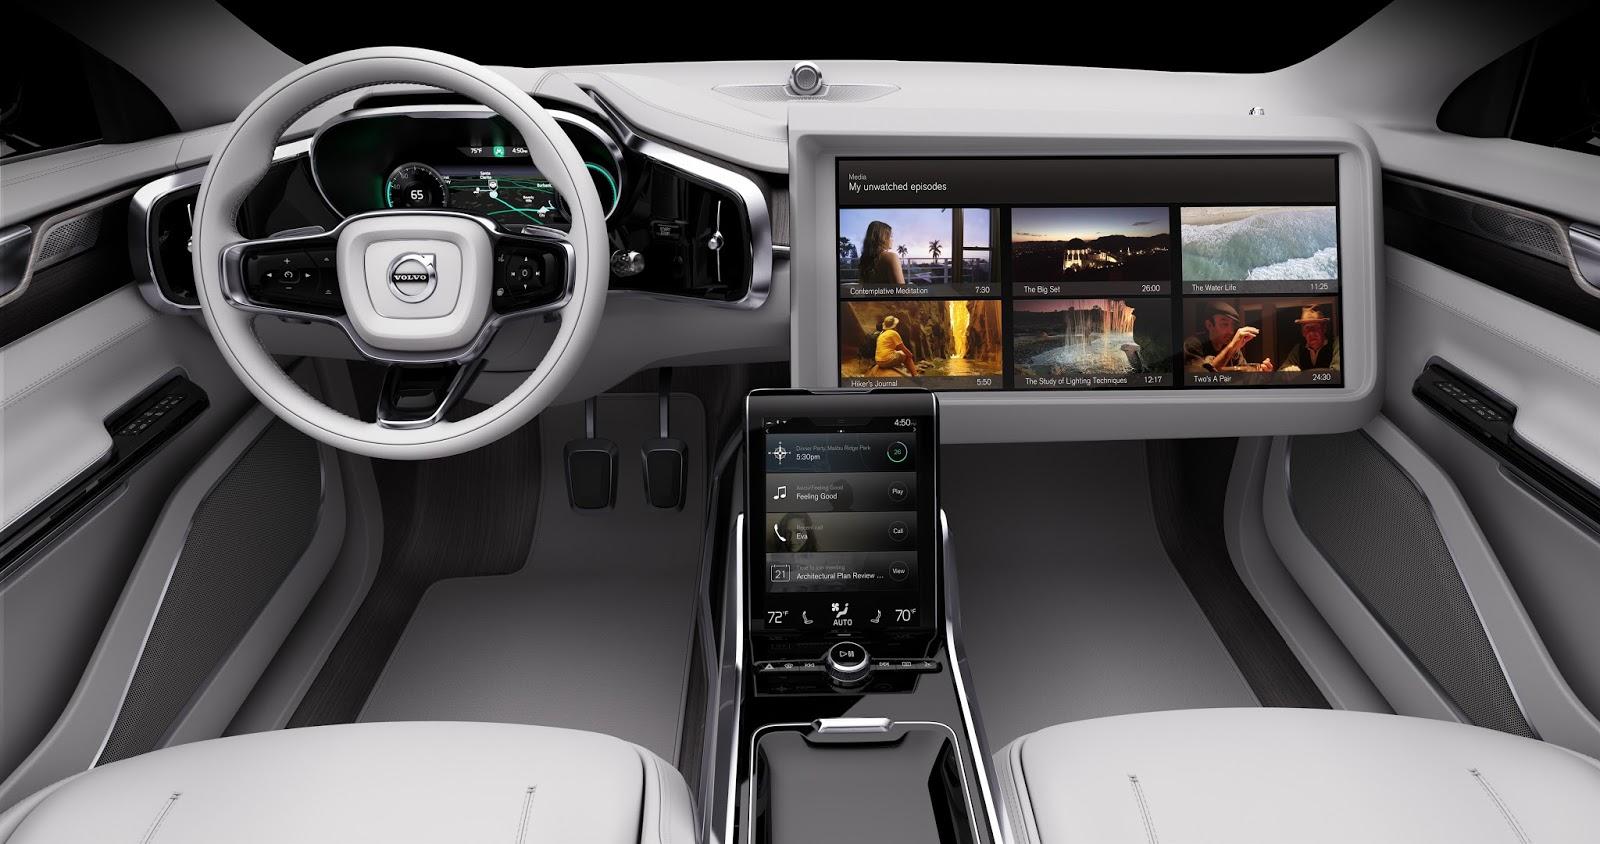 169546 Concept 26 Η Volvo θα κάνει και την αυτόνομη οδήγηση διασκεδαστική Autonomous Driving, Volvo, Volvo XC90, Αυτόνομη οδήγηση